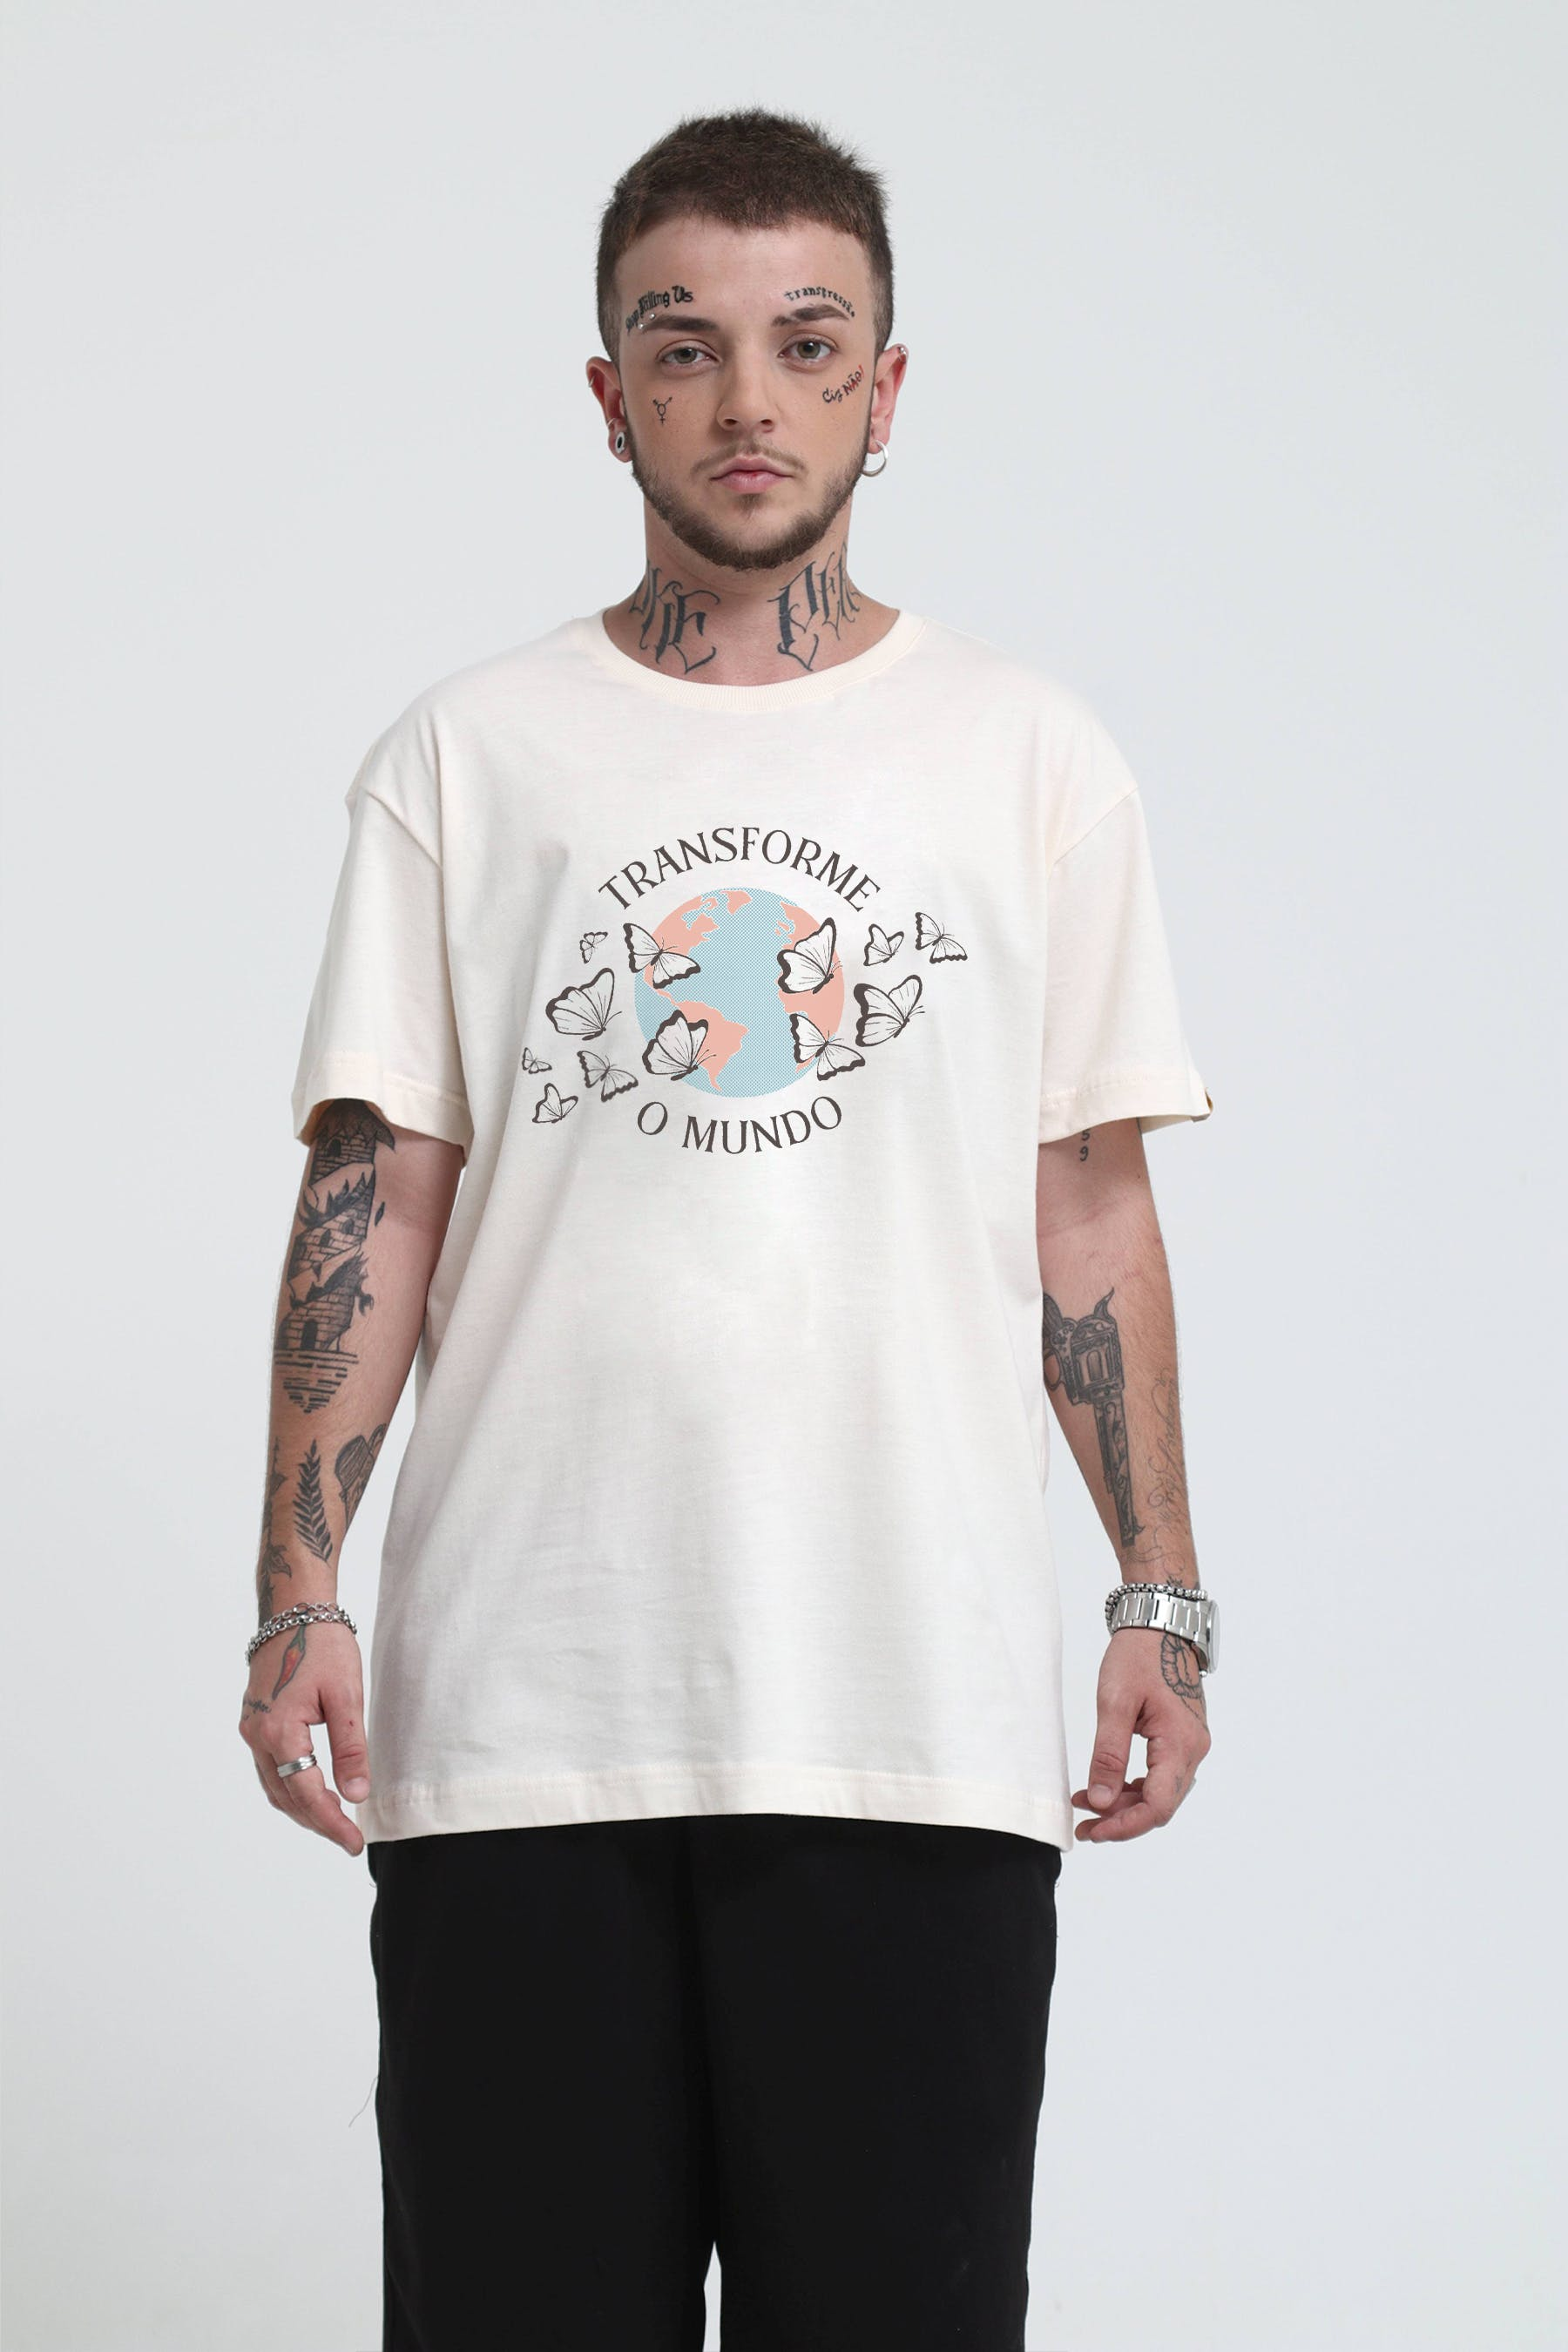 Camiseta Transforme